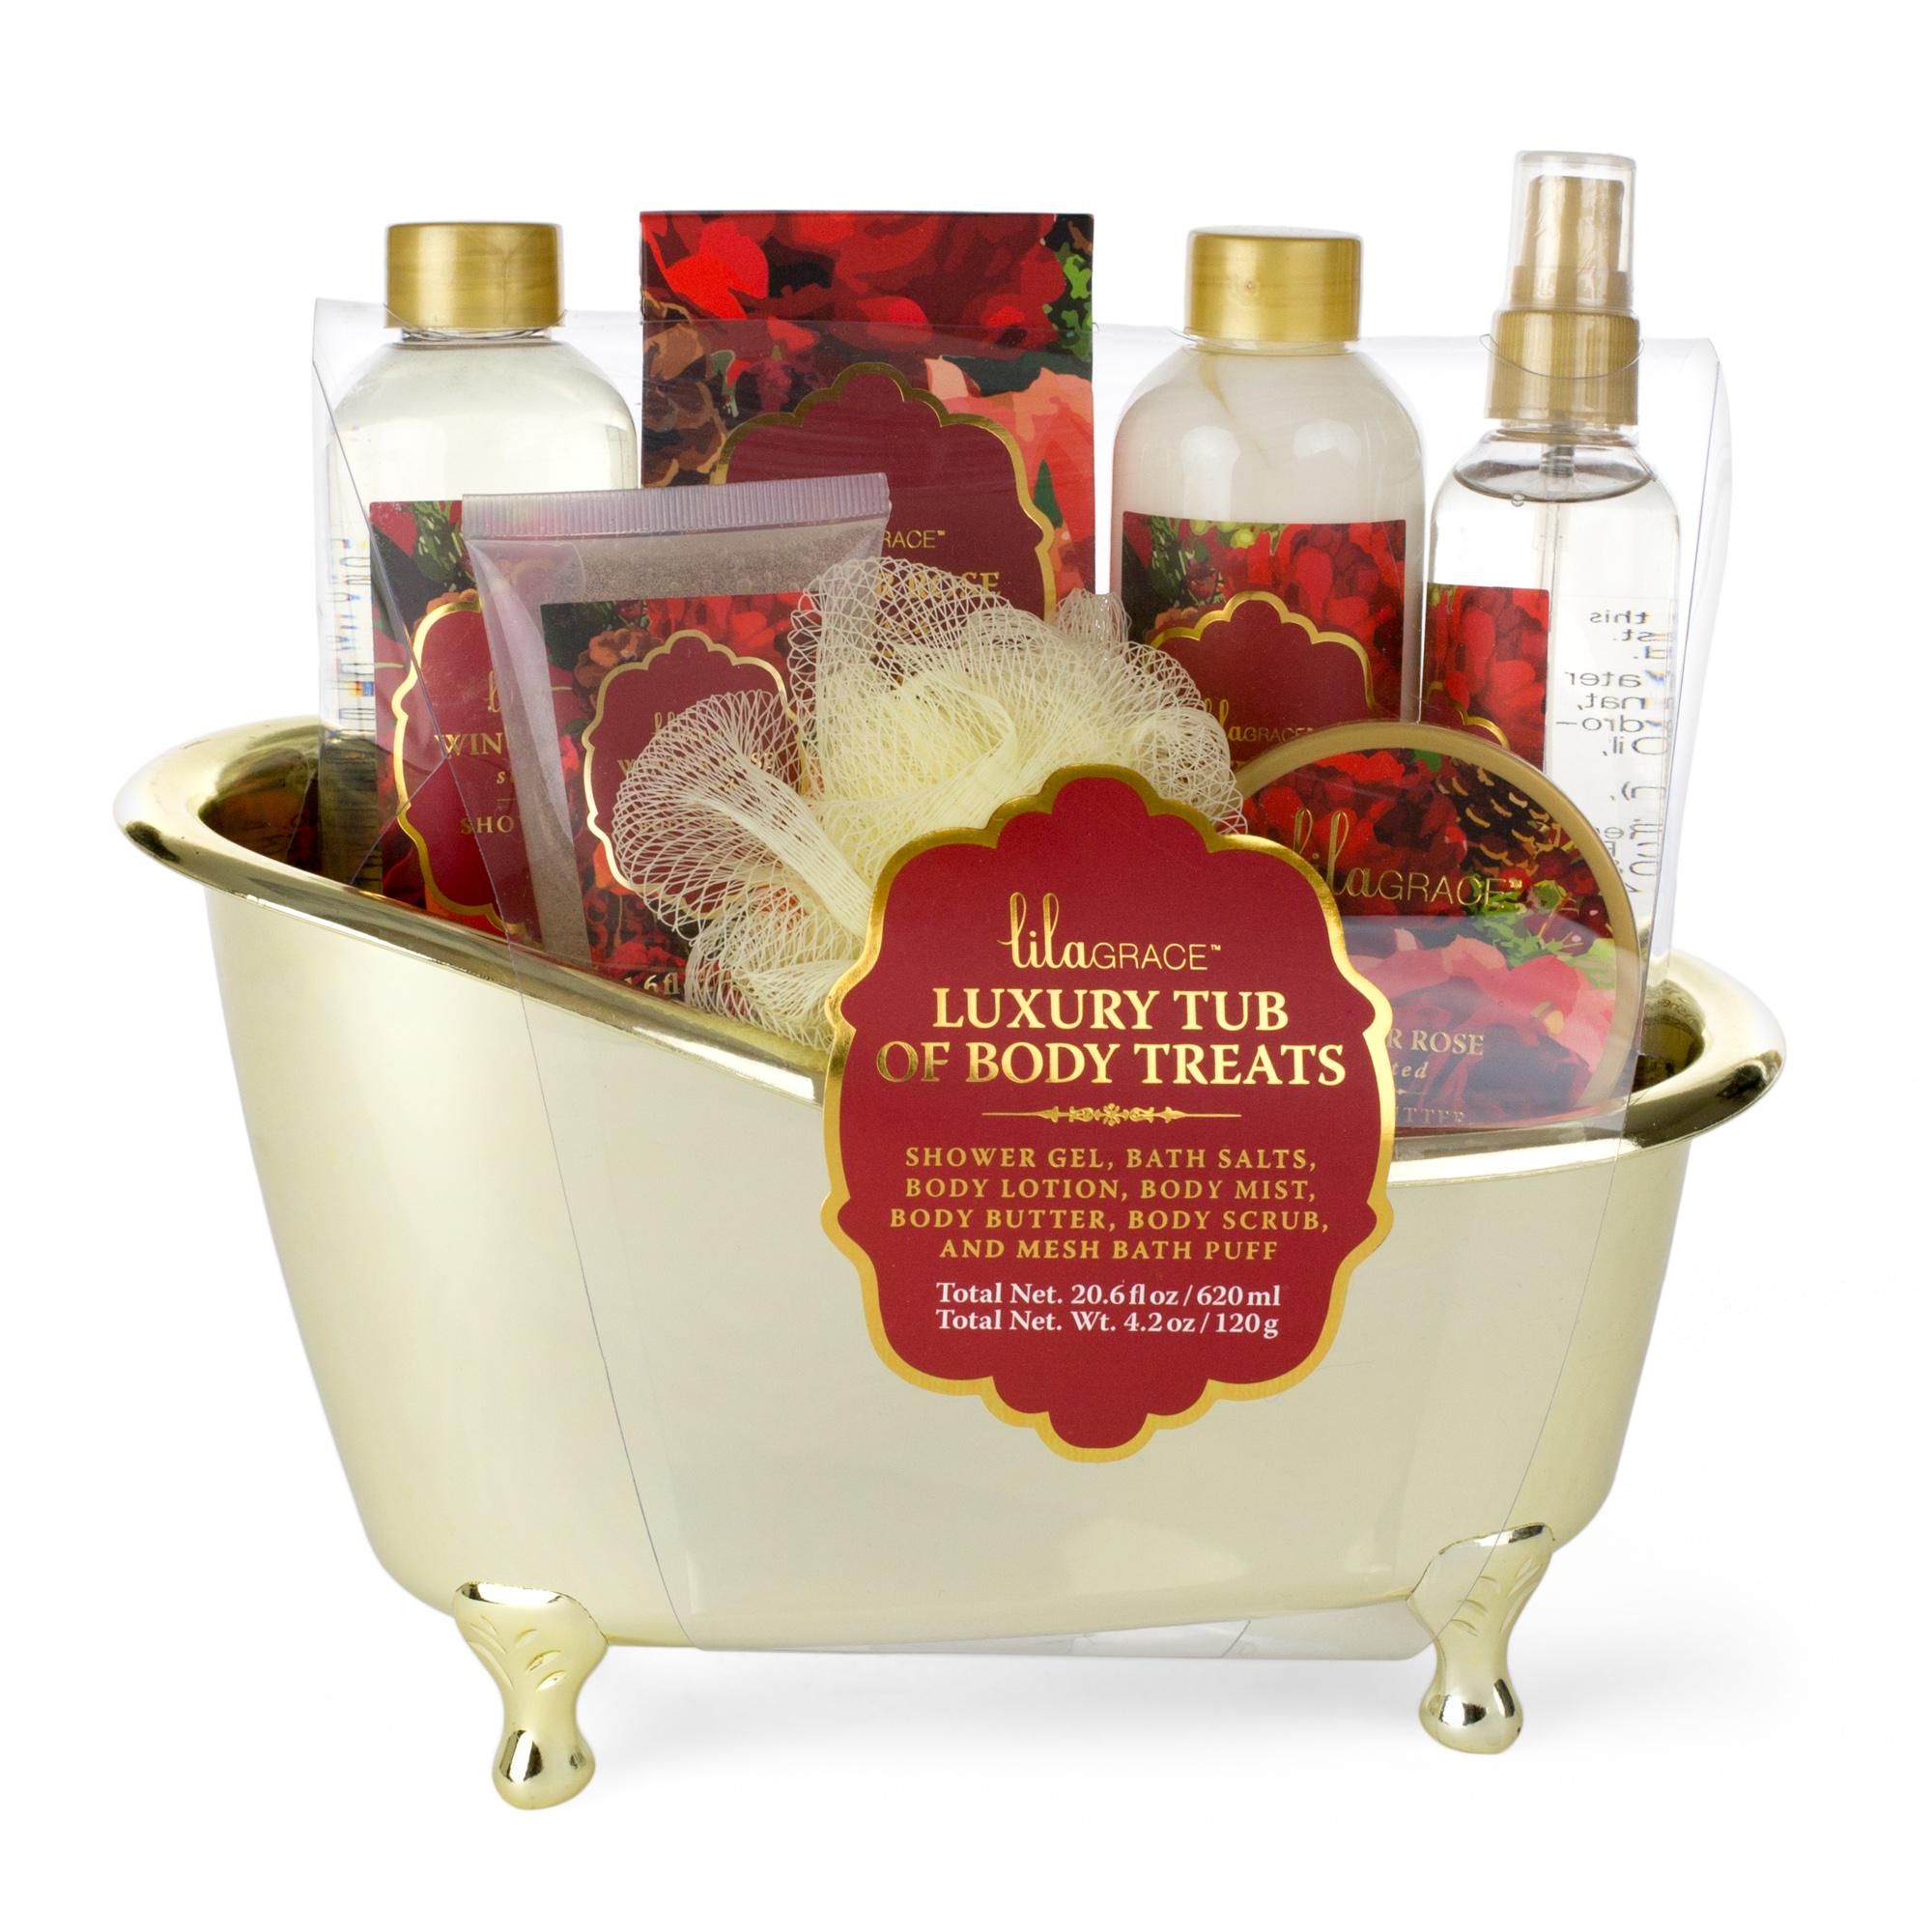 Bath Gift Sets For Women And Men At Kmart